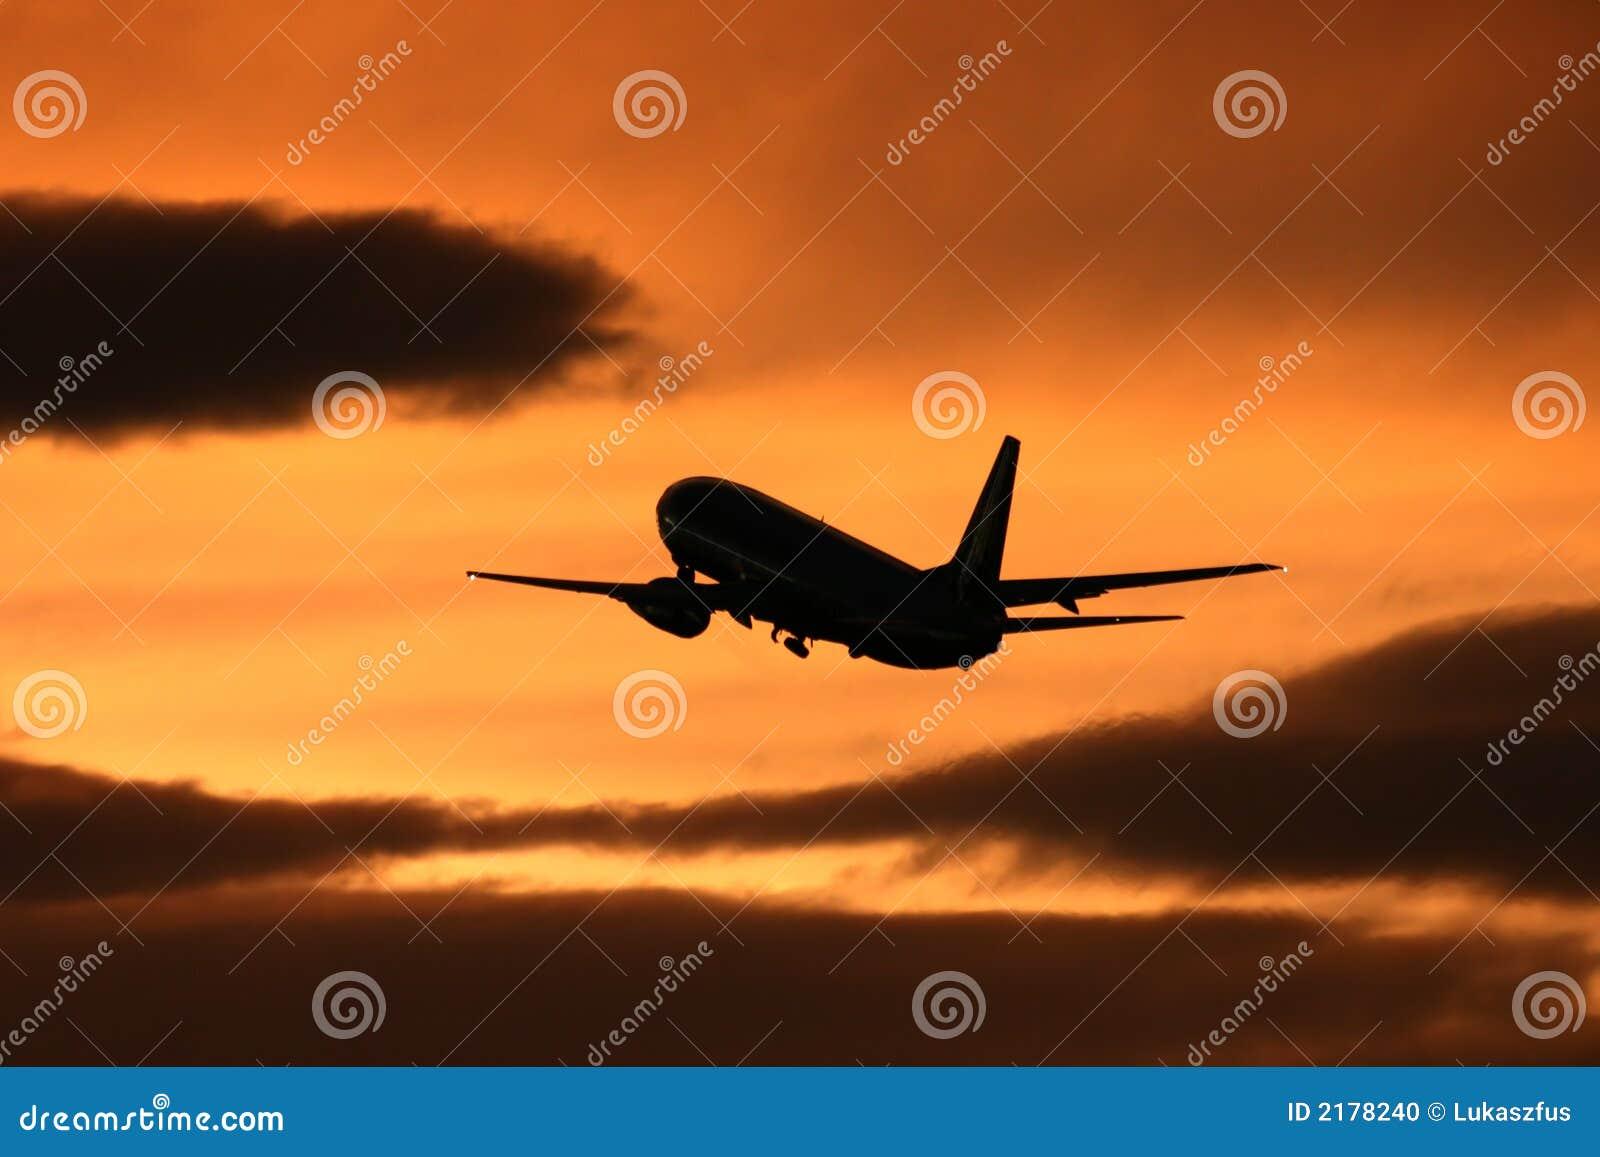 Jet Taking Flight